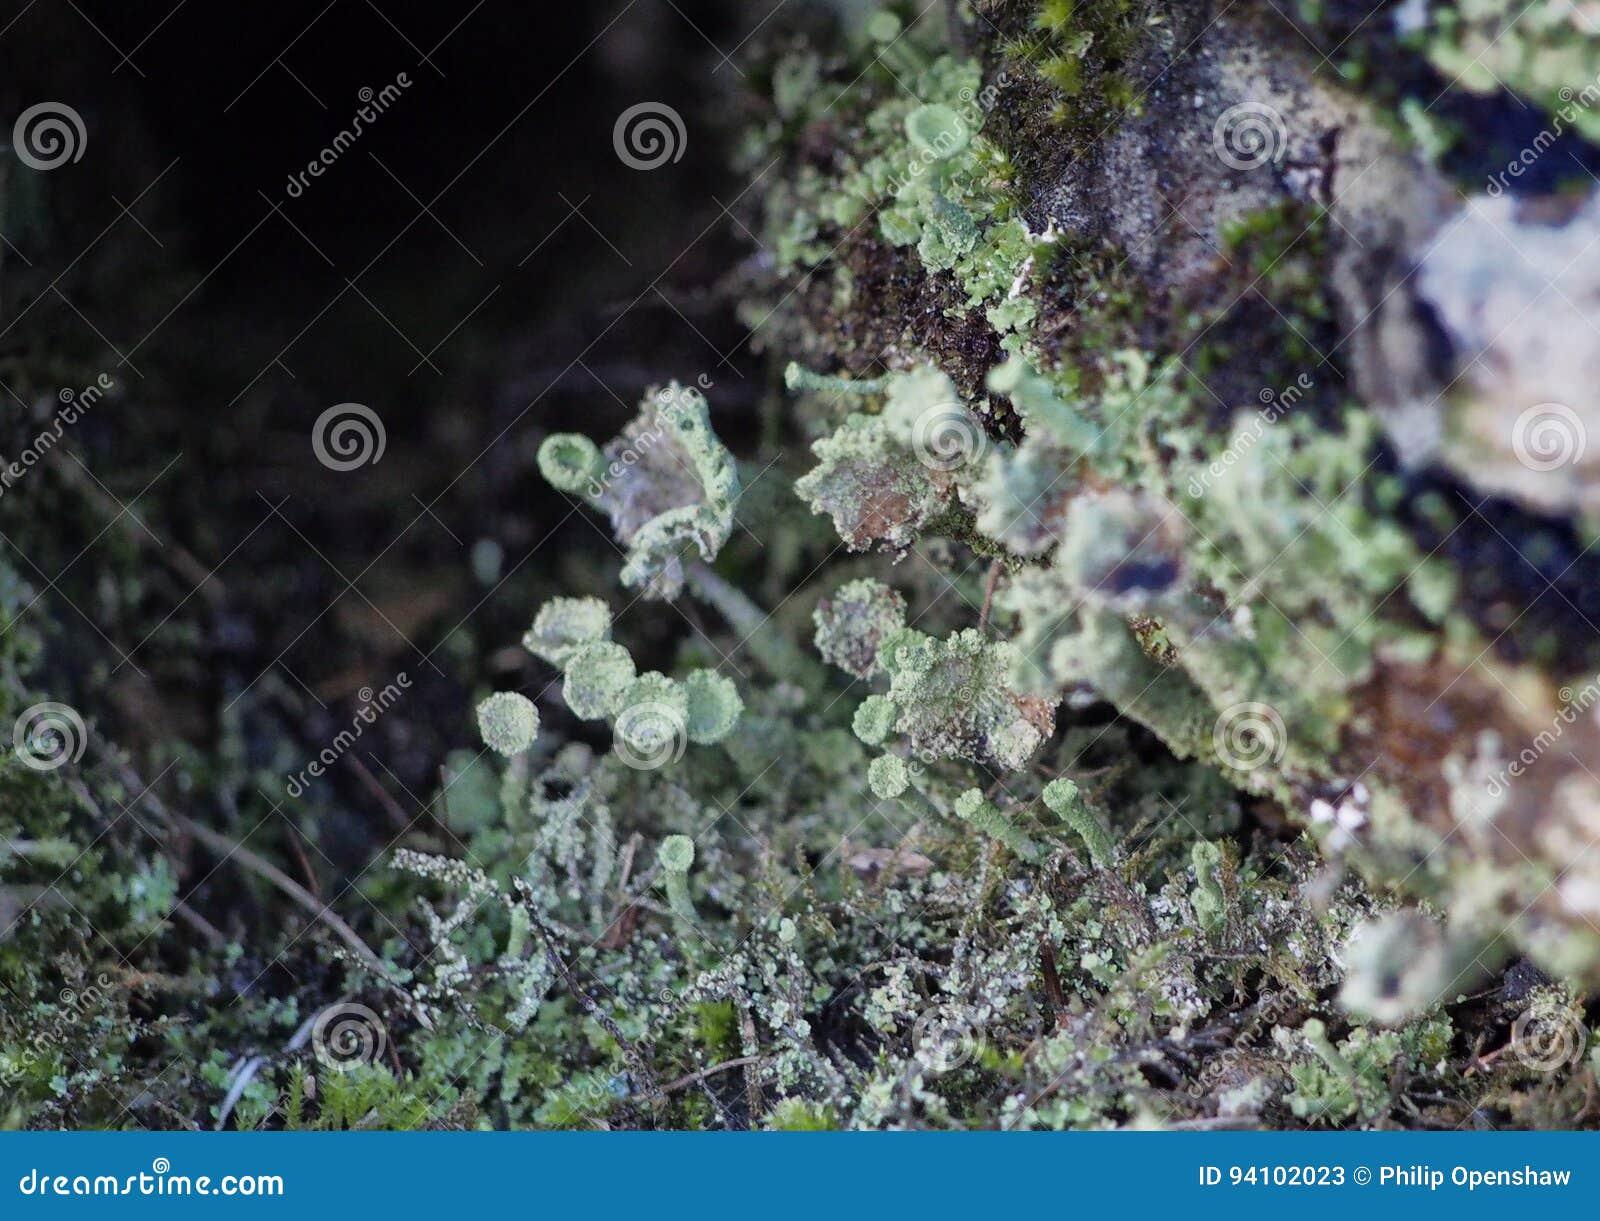 Macro photo of lichen